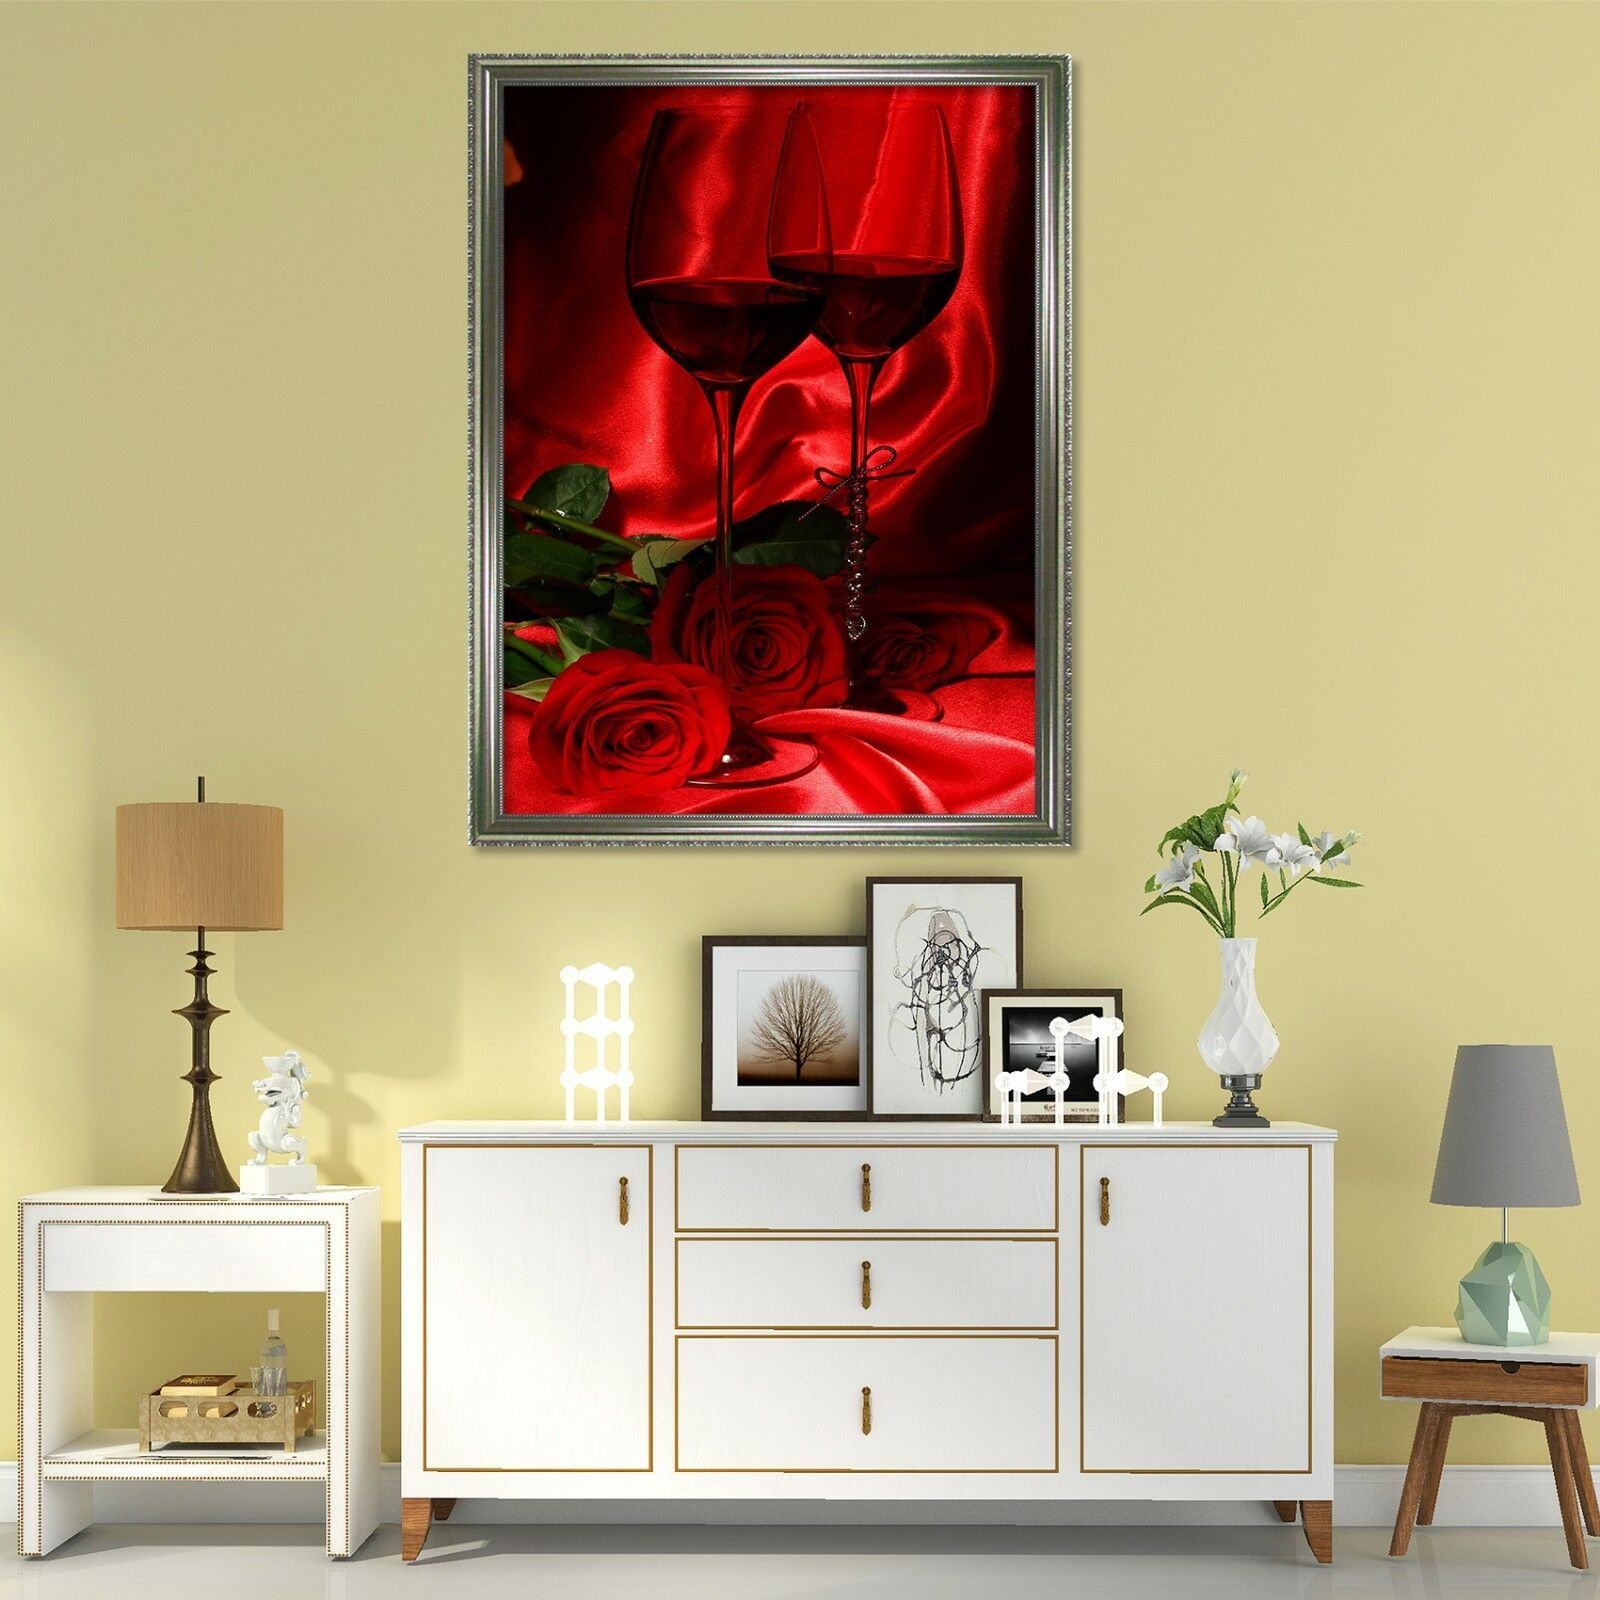 3D Red Wine pinks 2 Framed Poster Home Decor Print Painting Art AJ WALLPAPER